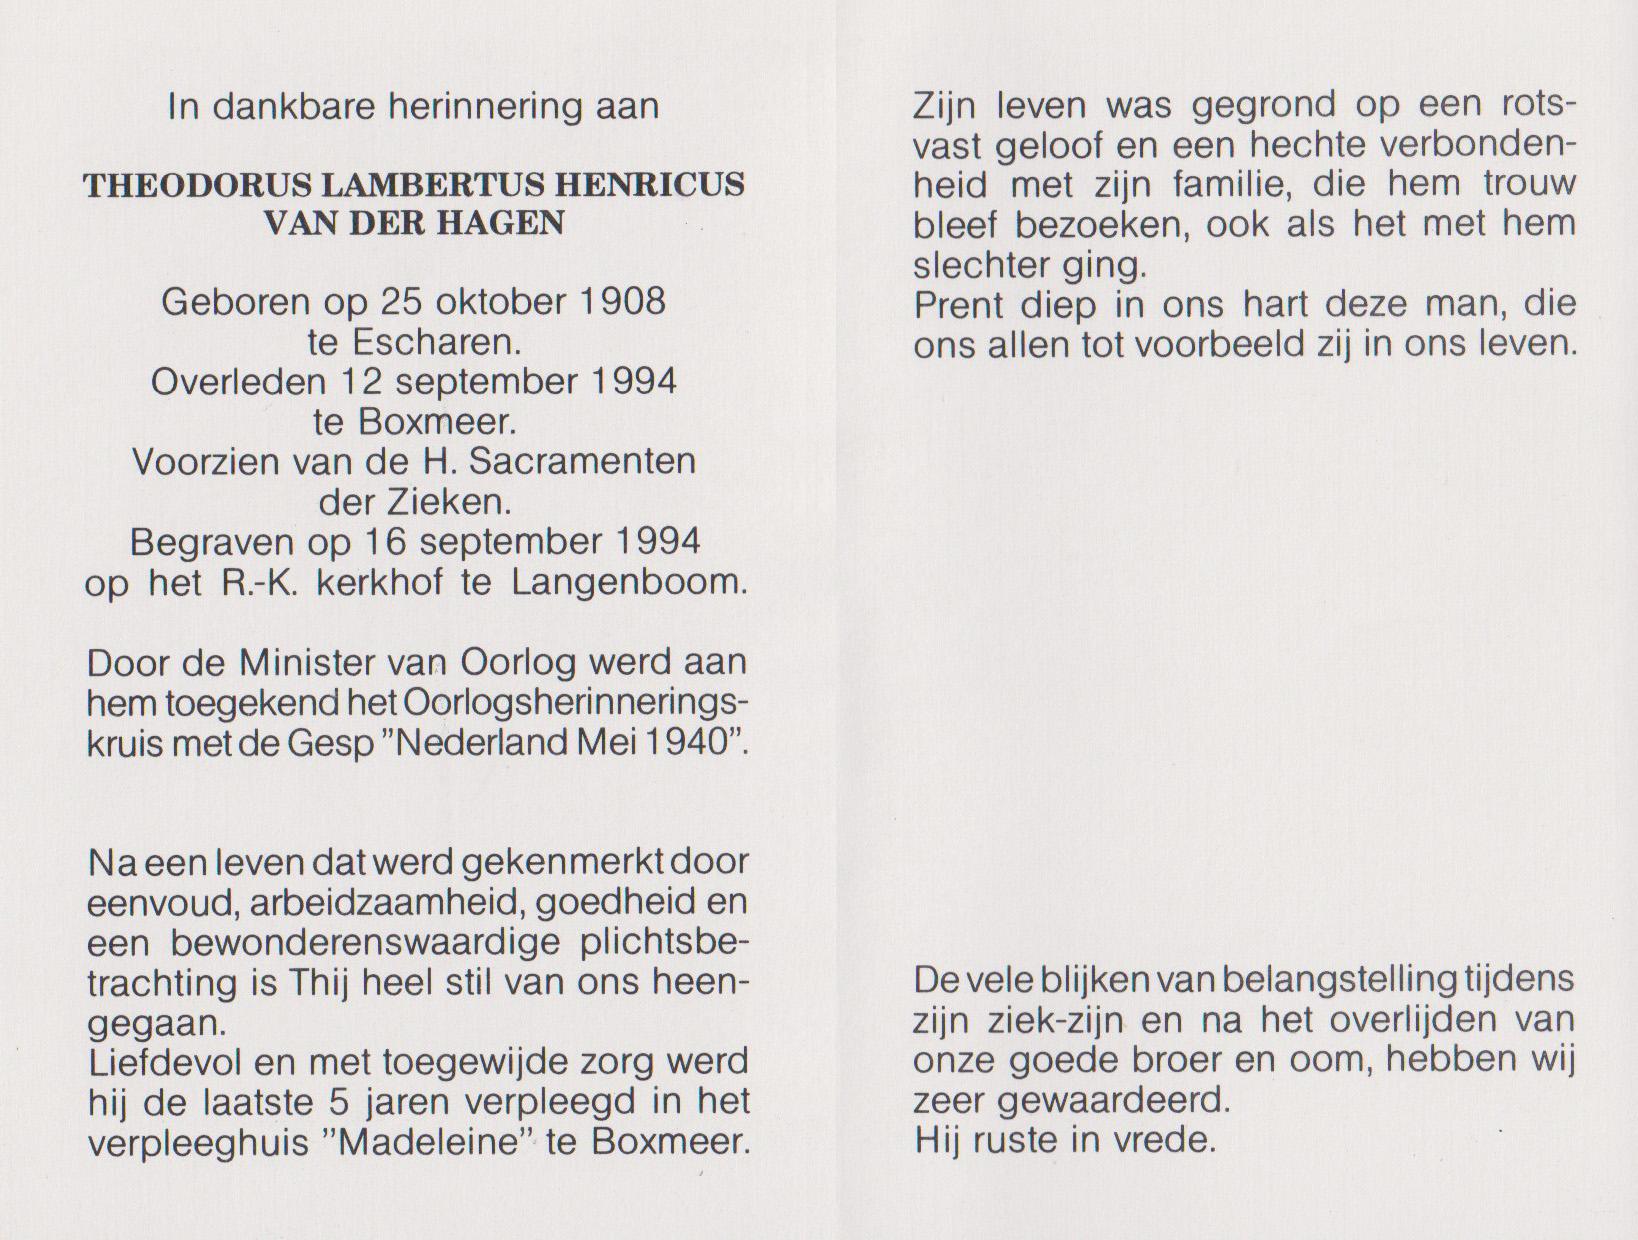 Bidprentje Theodorus Lamb. Henr.Hagen